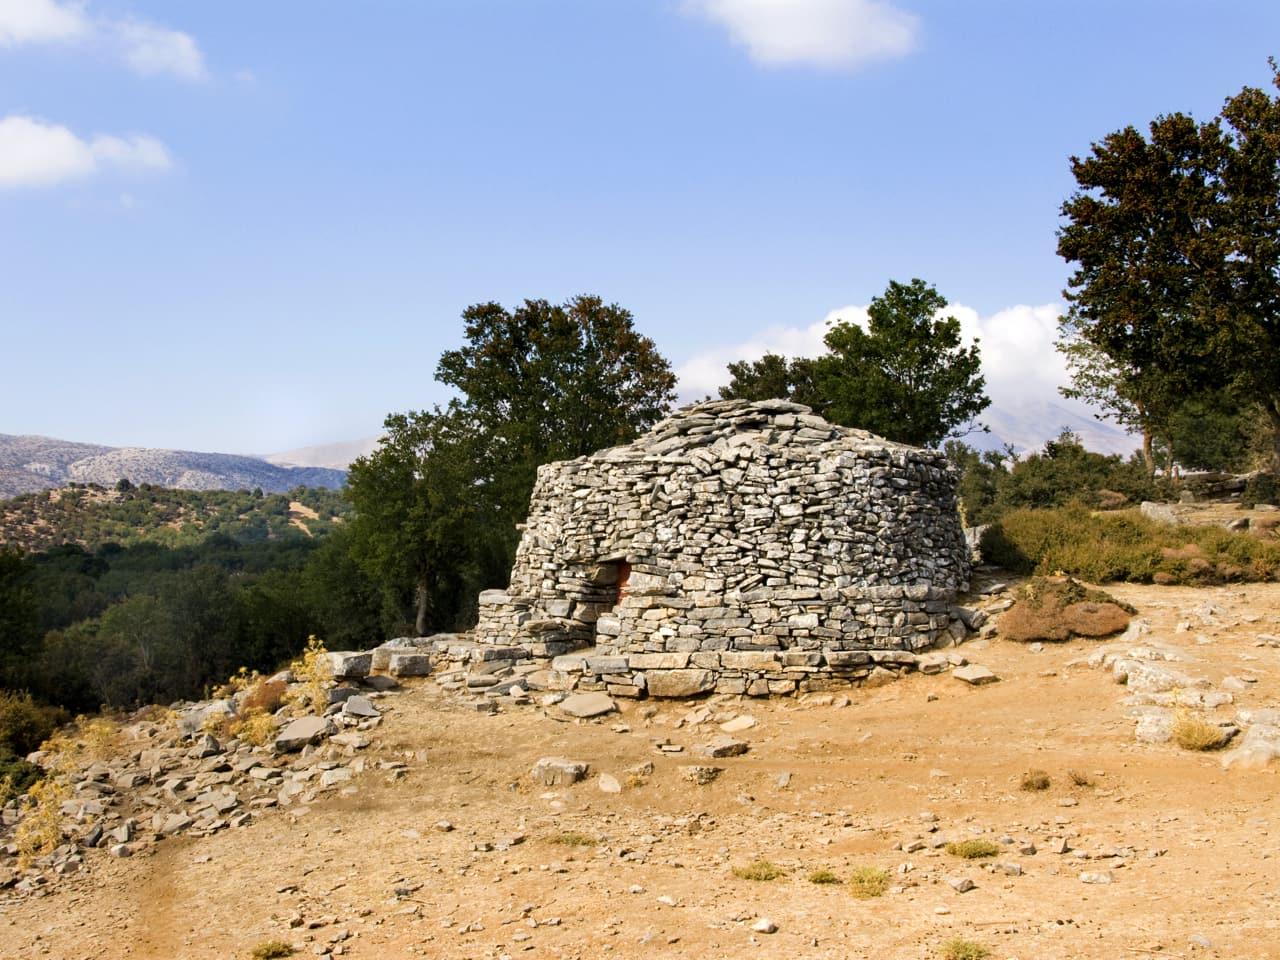 mitato, Anogia Village Rethimno Crete, anogia village travel guide, anogia village things to do, anogia gastronomy, anogia village music